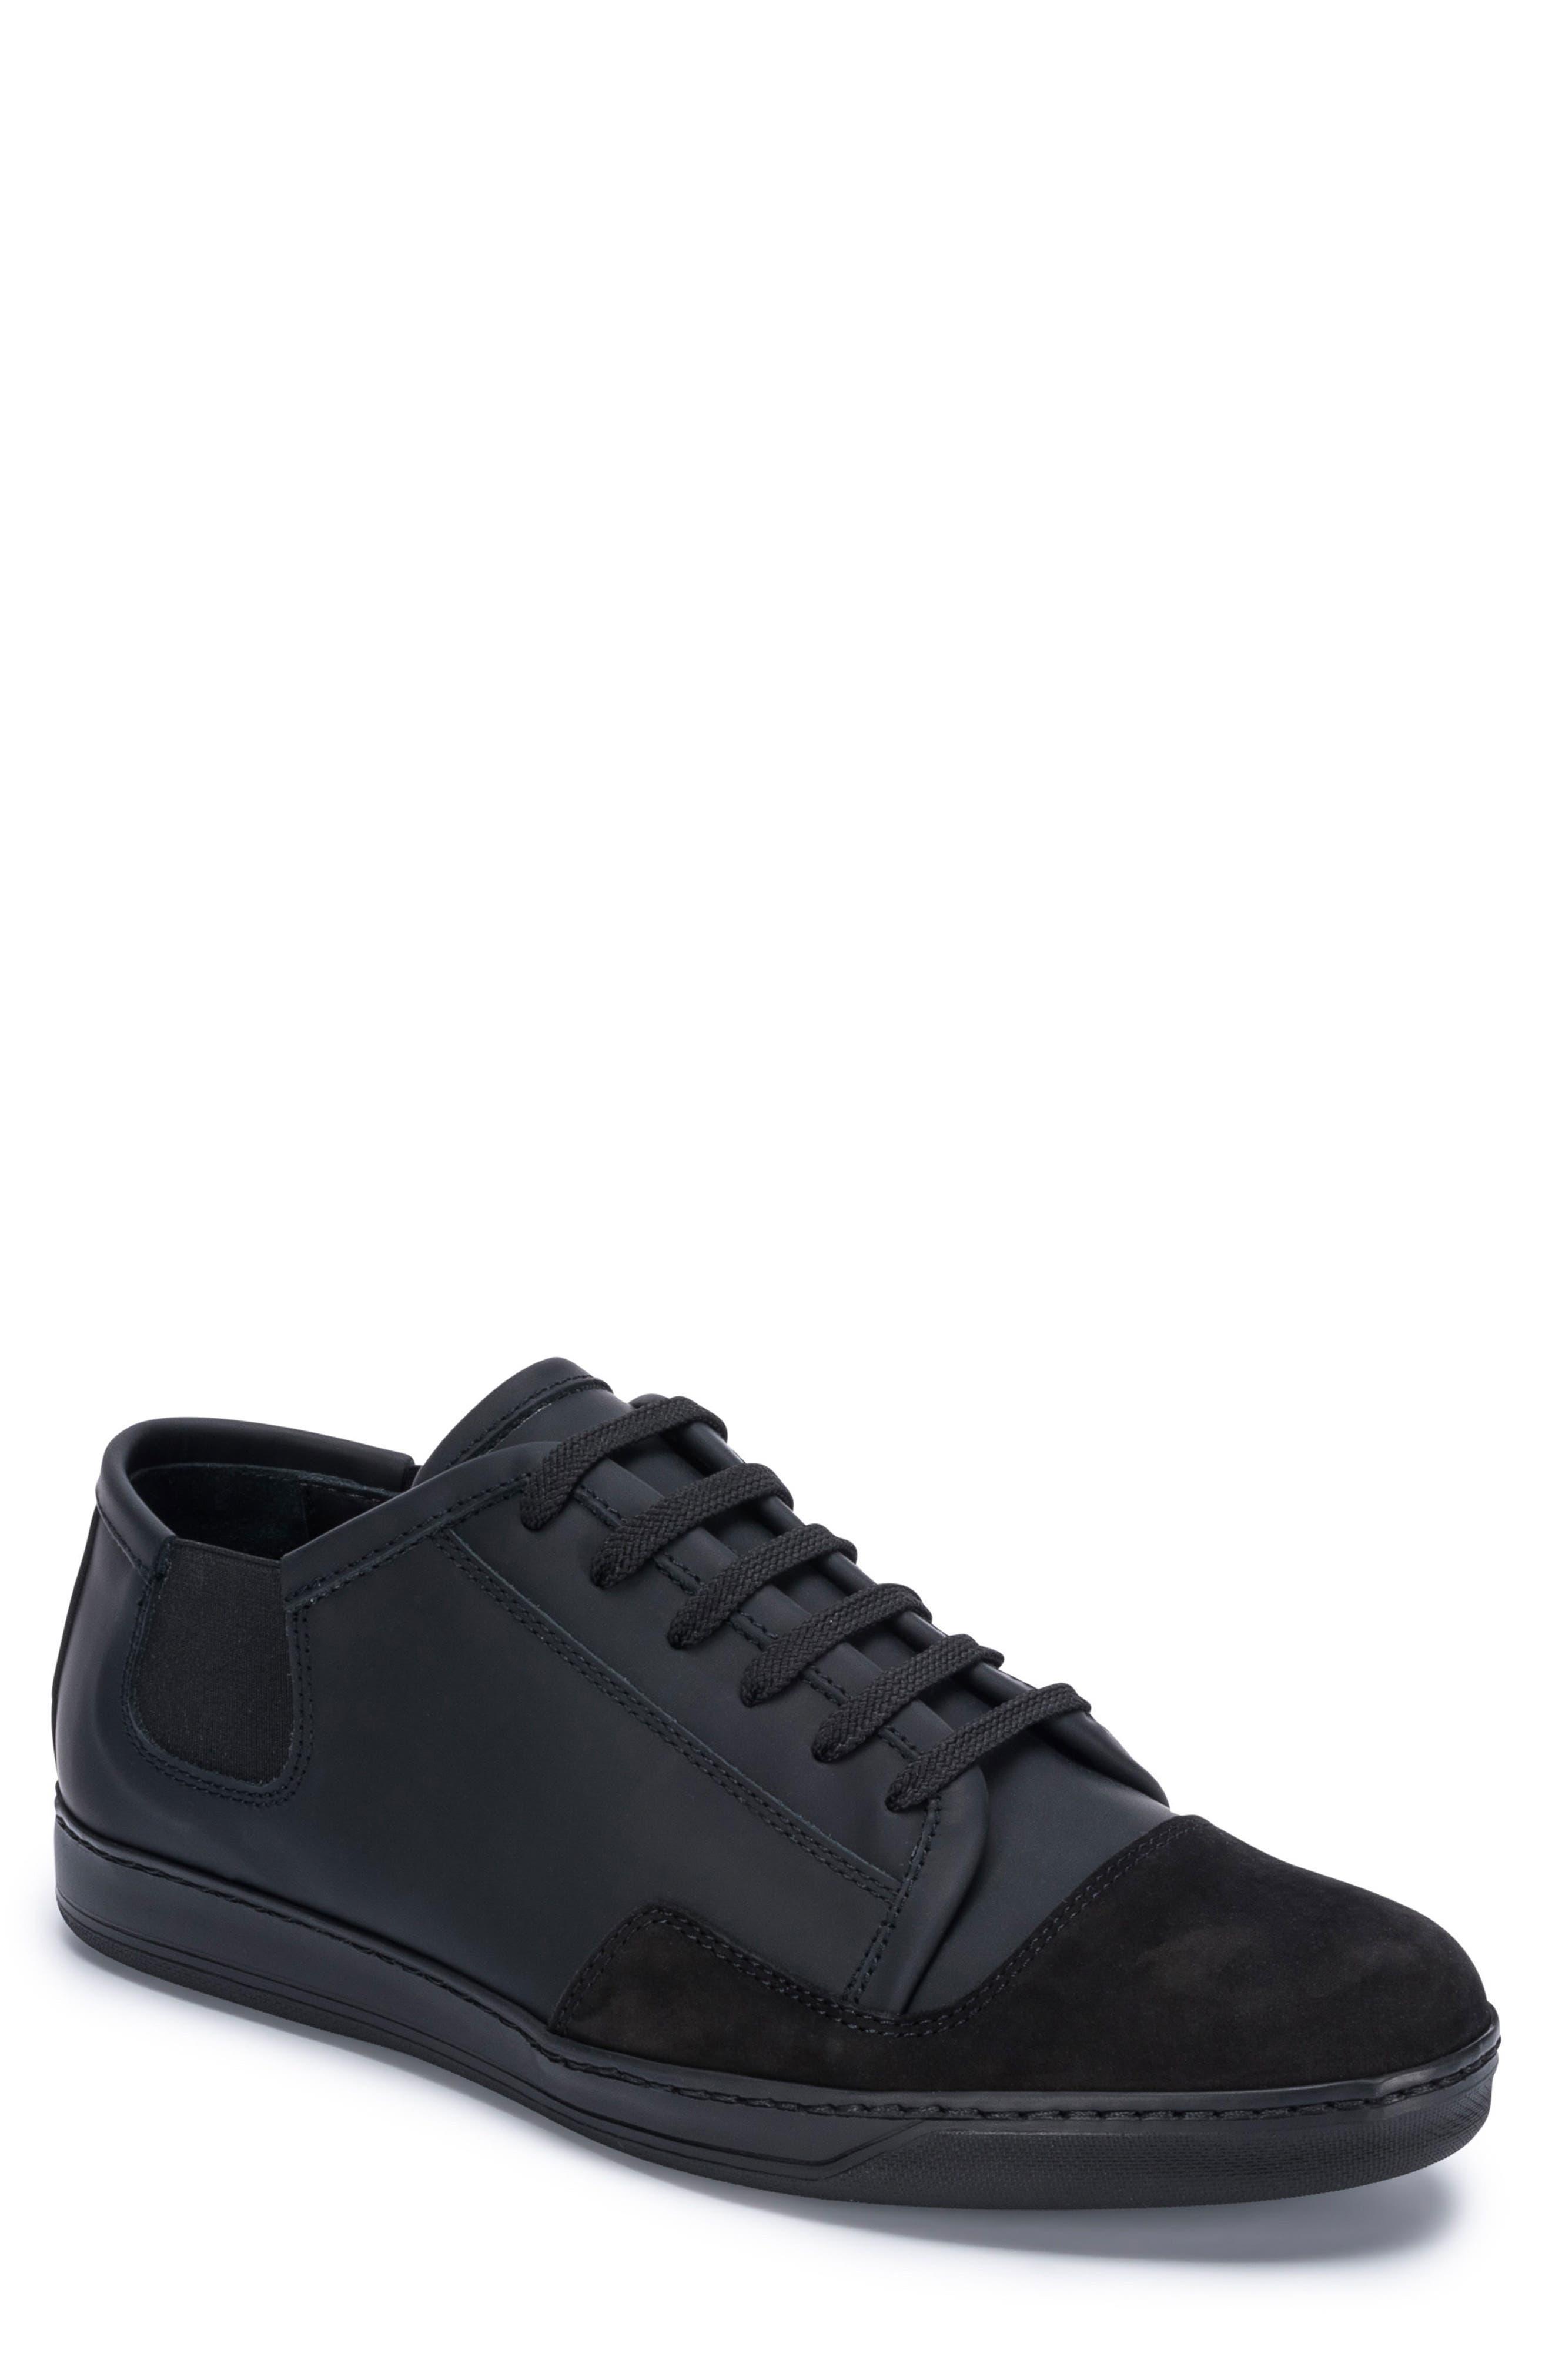 Bellagio Sneaker,                             Main thumbnail 1, color,                             Black